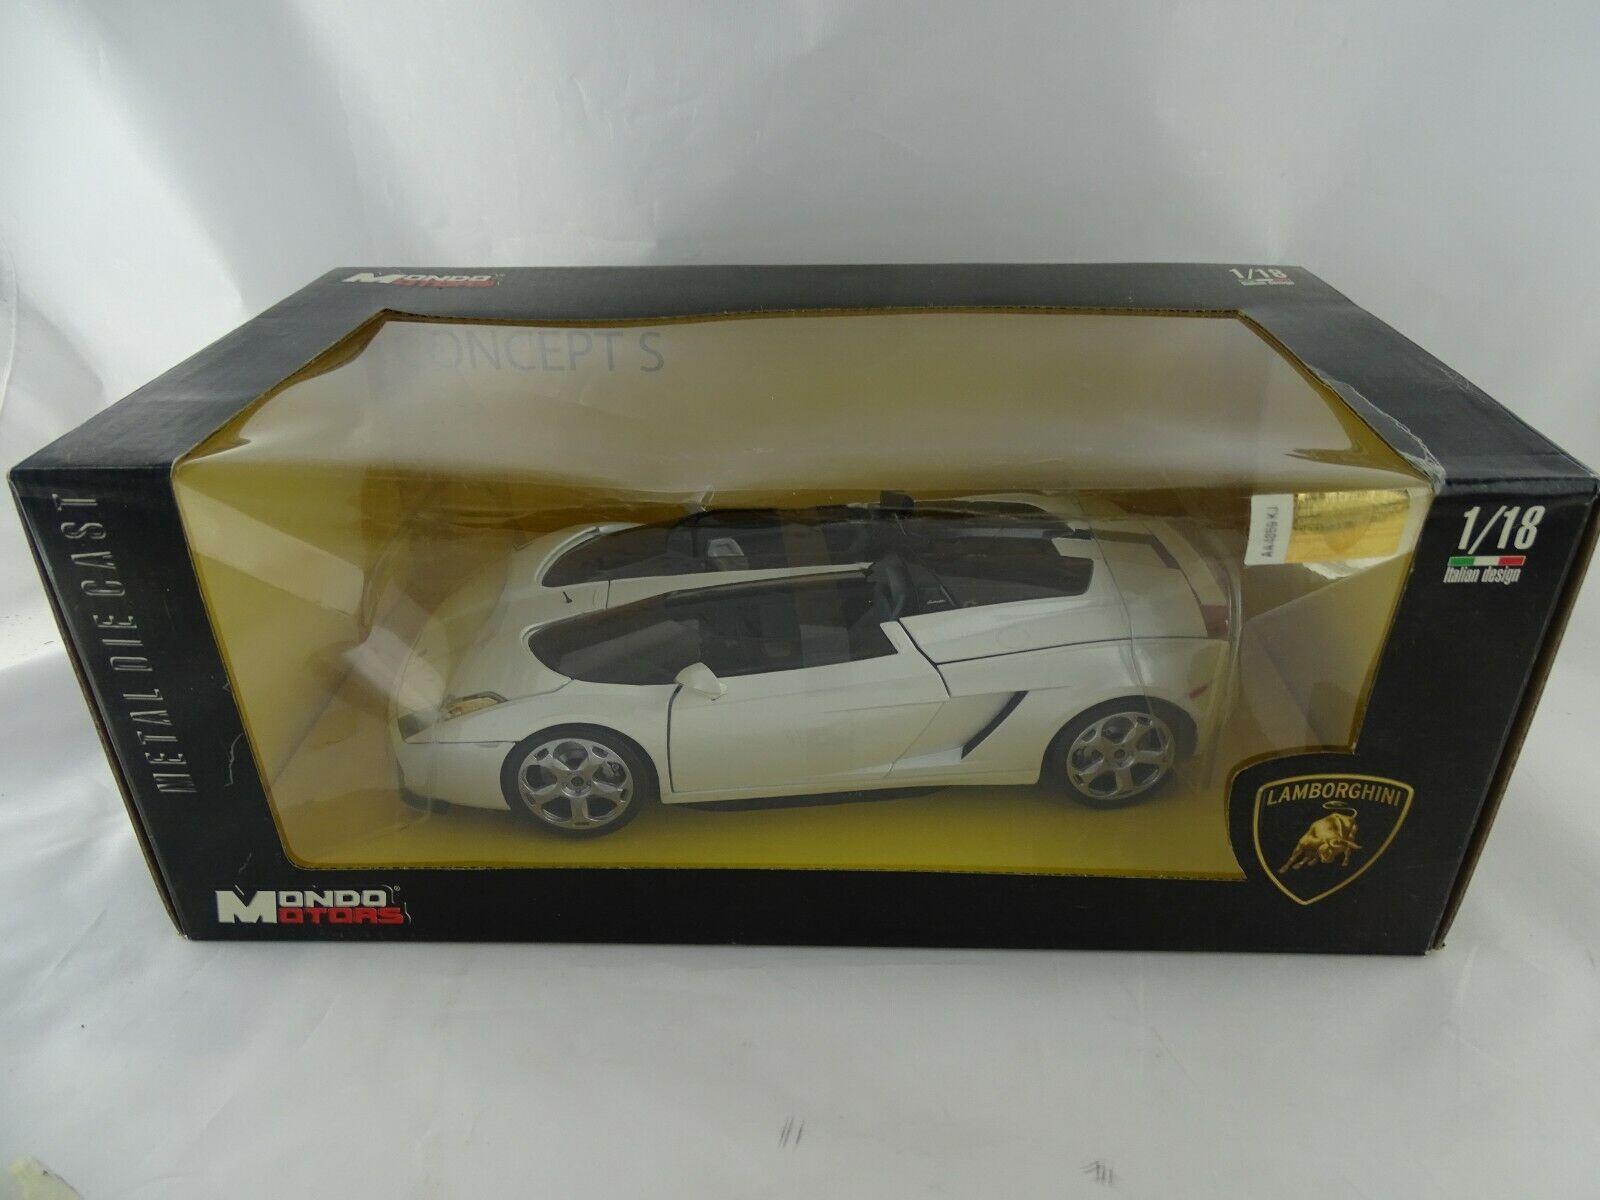 1 18 Mondo Motors Lamborghini Concept S weiß